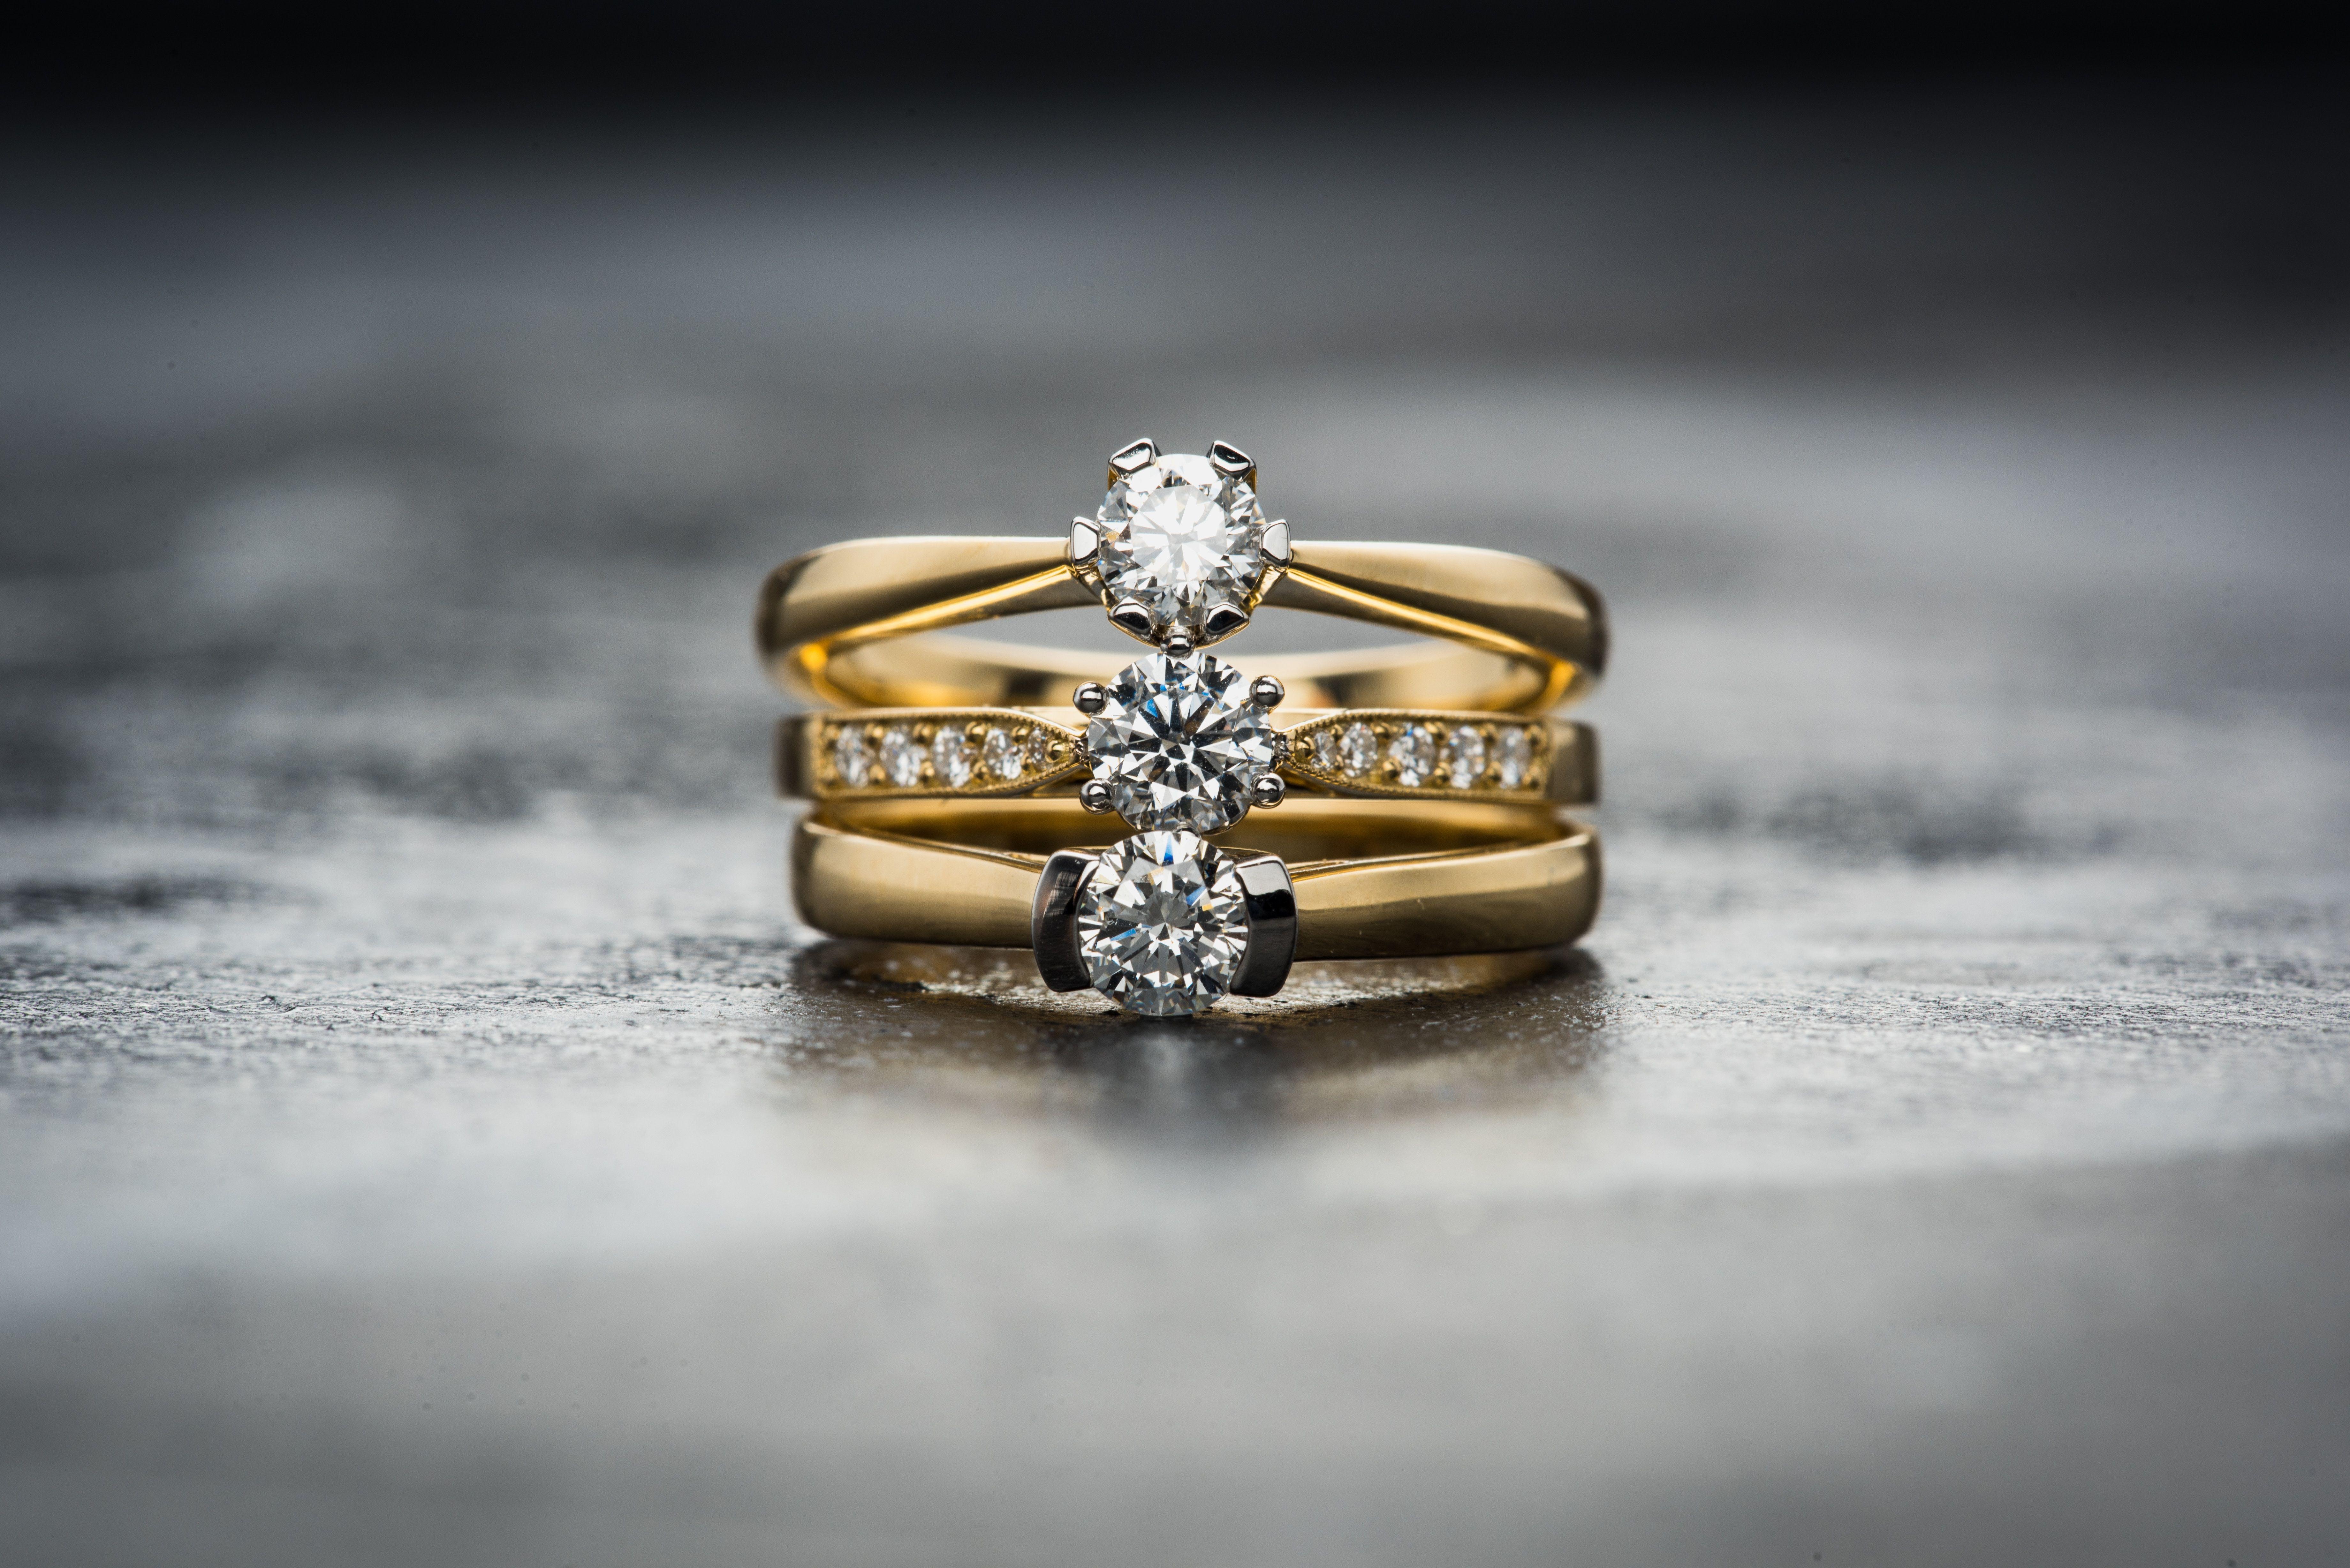 Compren Plata i diamants. FOTO: Jacek Dylag / Unsplash